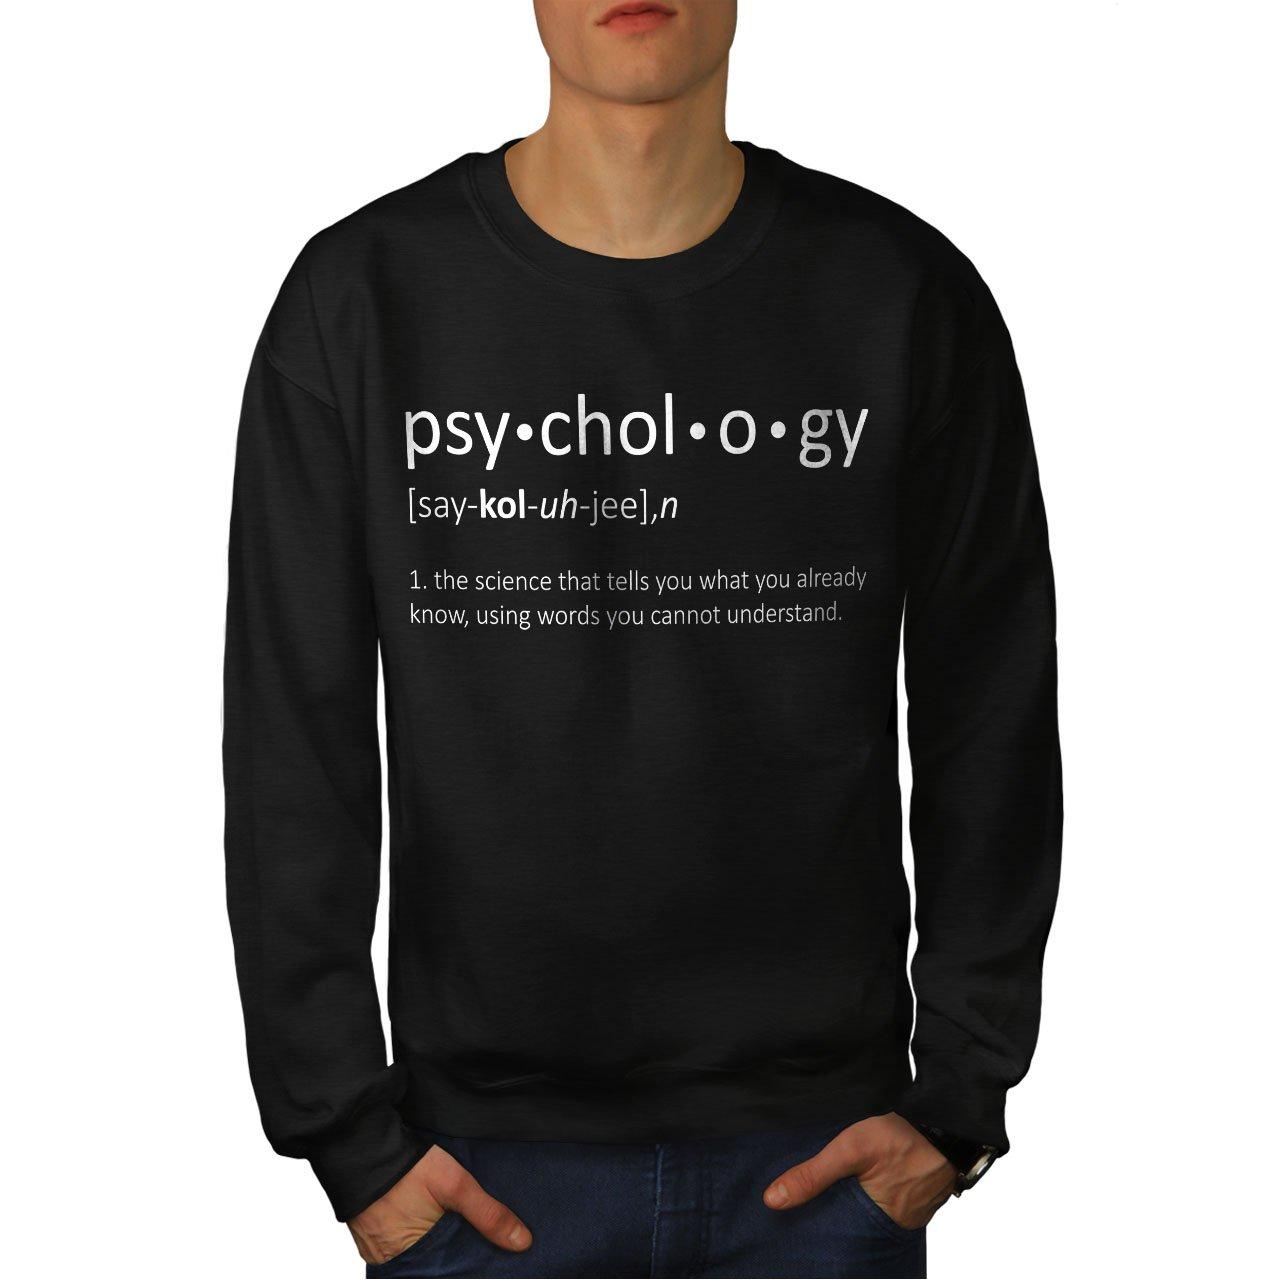 wellcoda Psychology Science Mens Sweatshirt Funny Casual Jumper